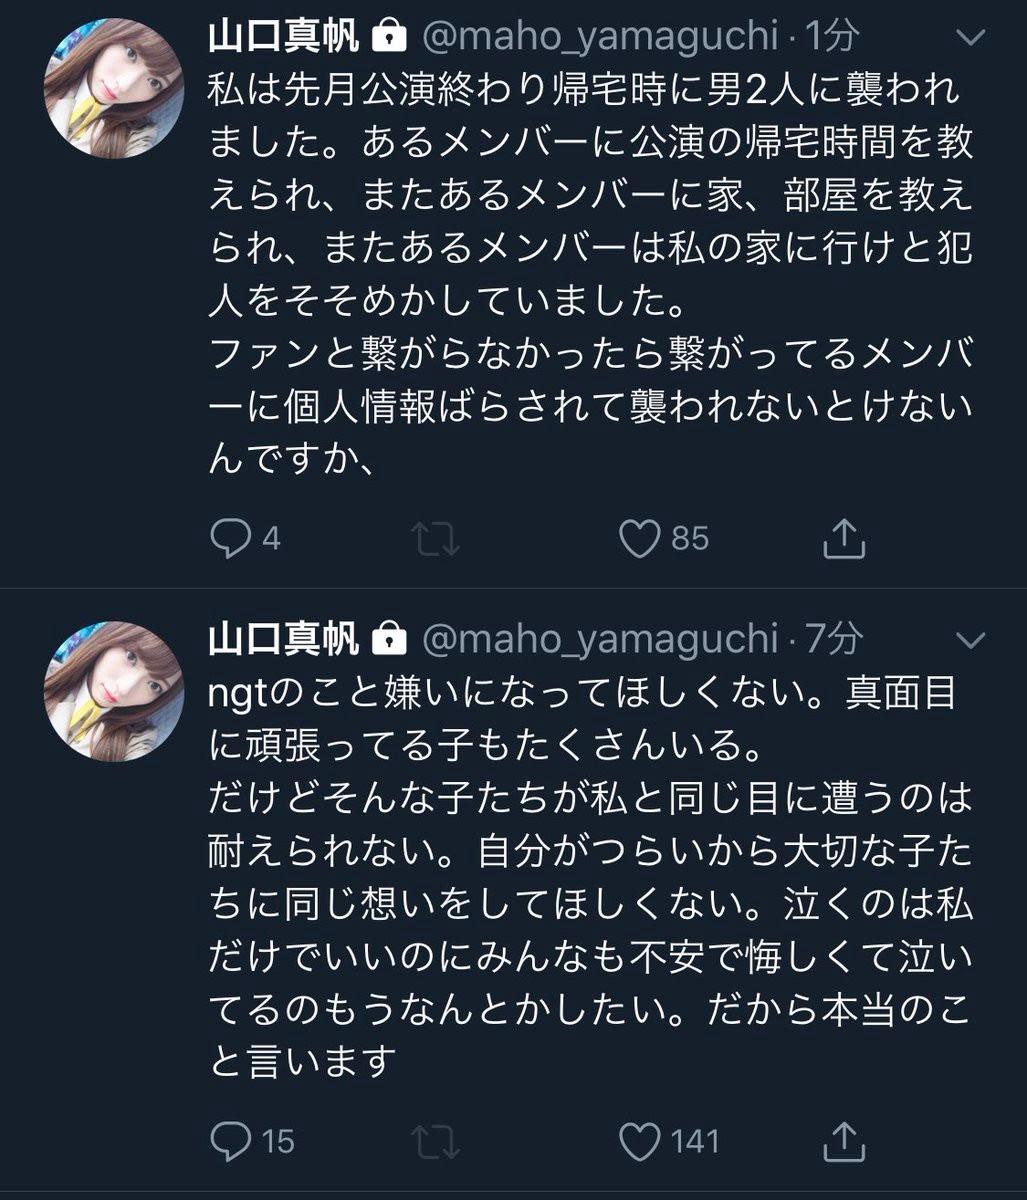 https://blogimg.goo.ne.jp/user_image/64/f0/f07fbf219e6c7791d1c3fdb79b38f084.jpg